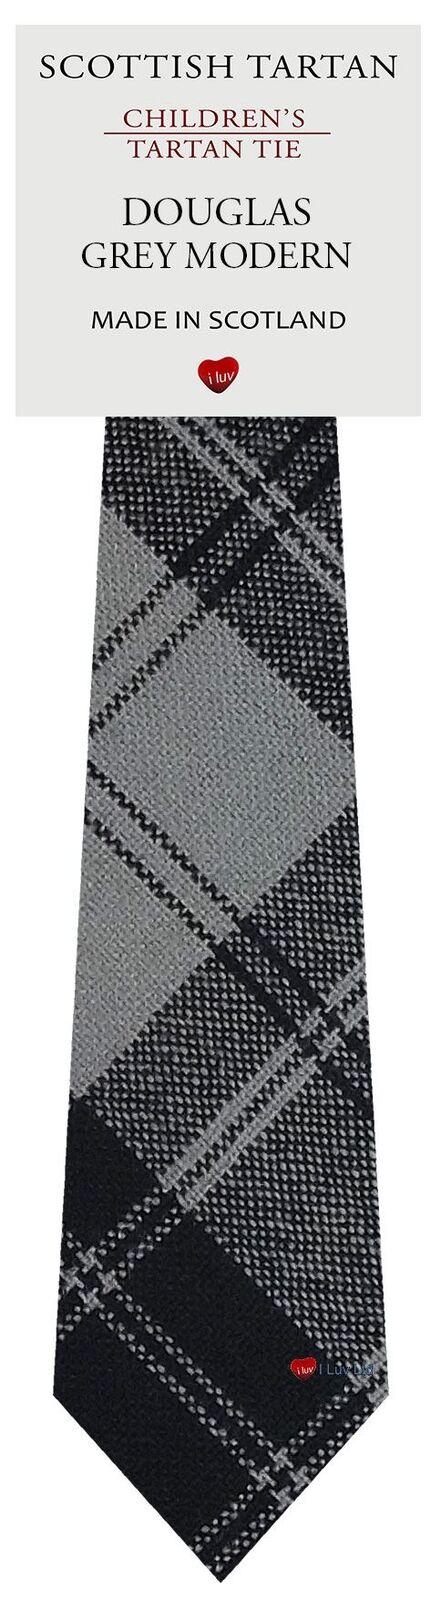 Boys Clan Tie Made in Scotland Douglas Grey Modern Tartan